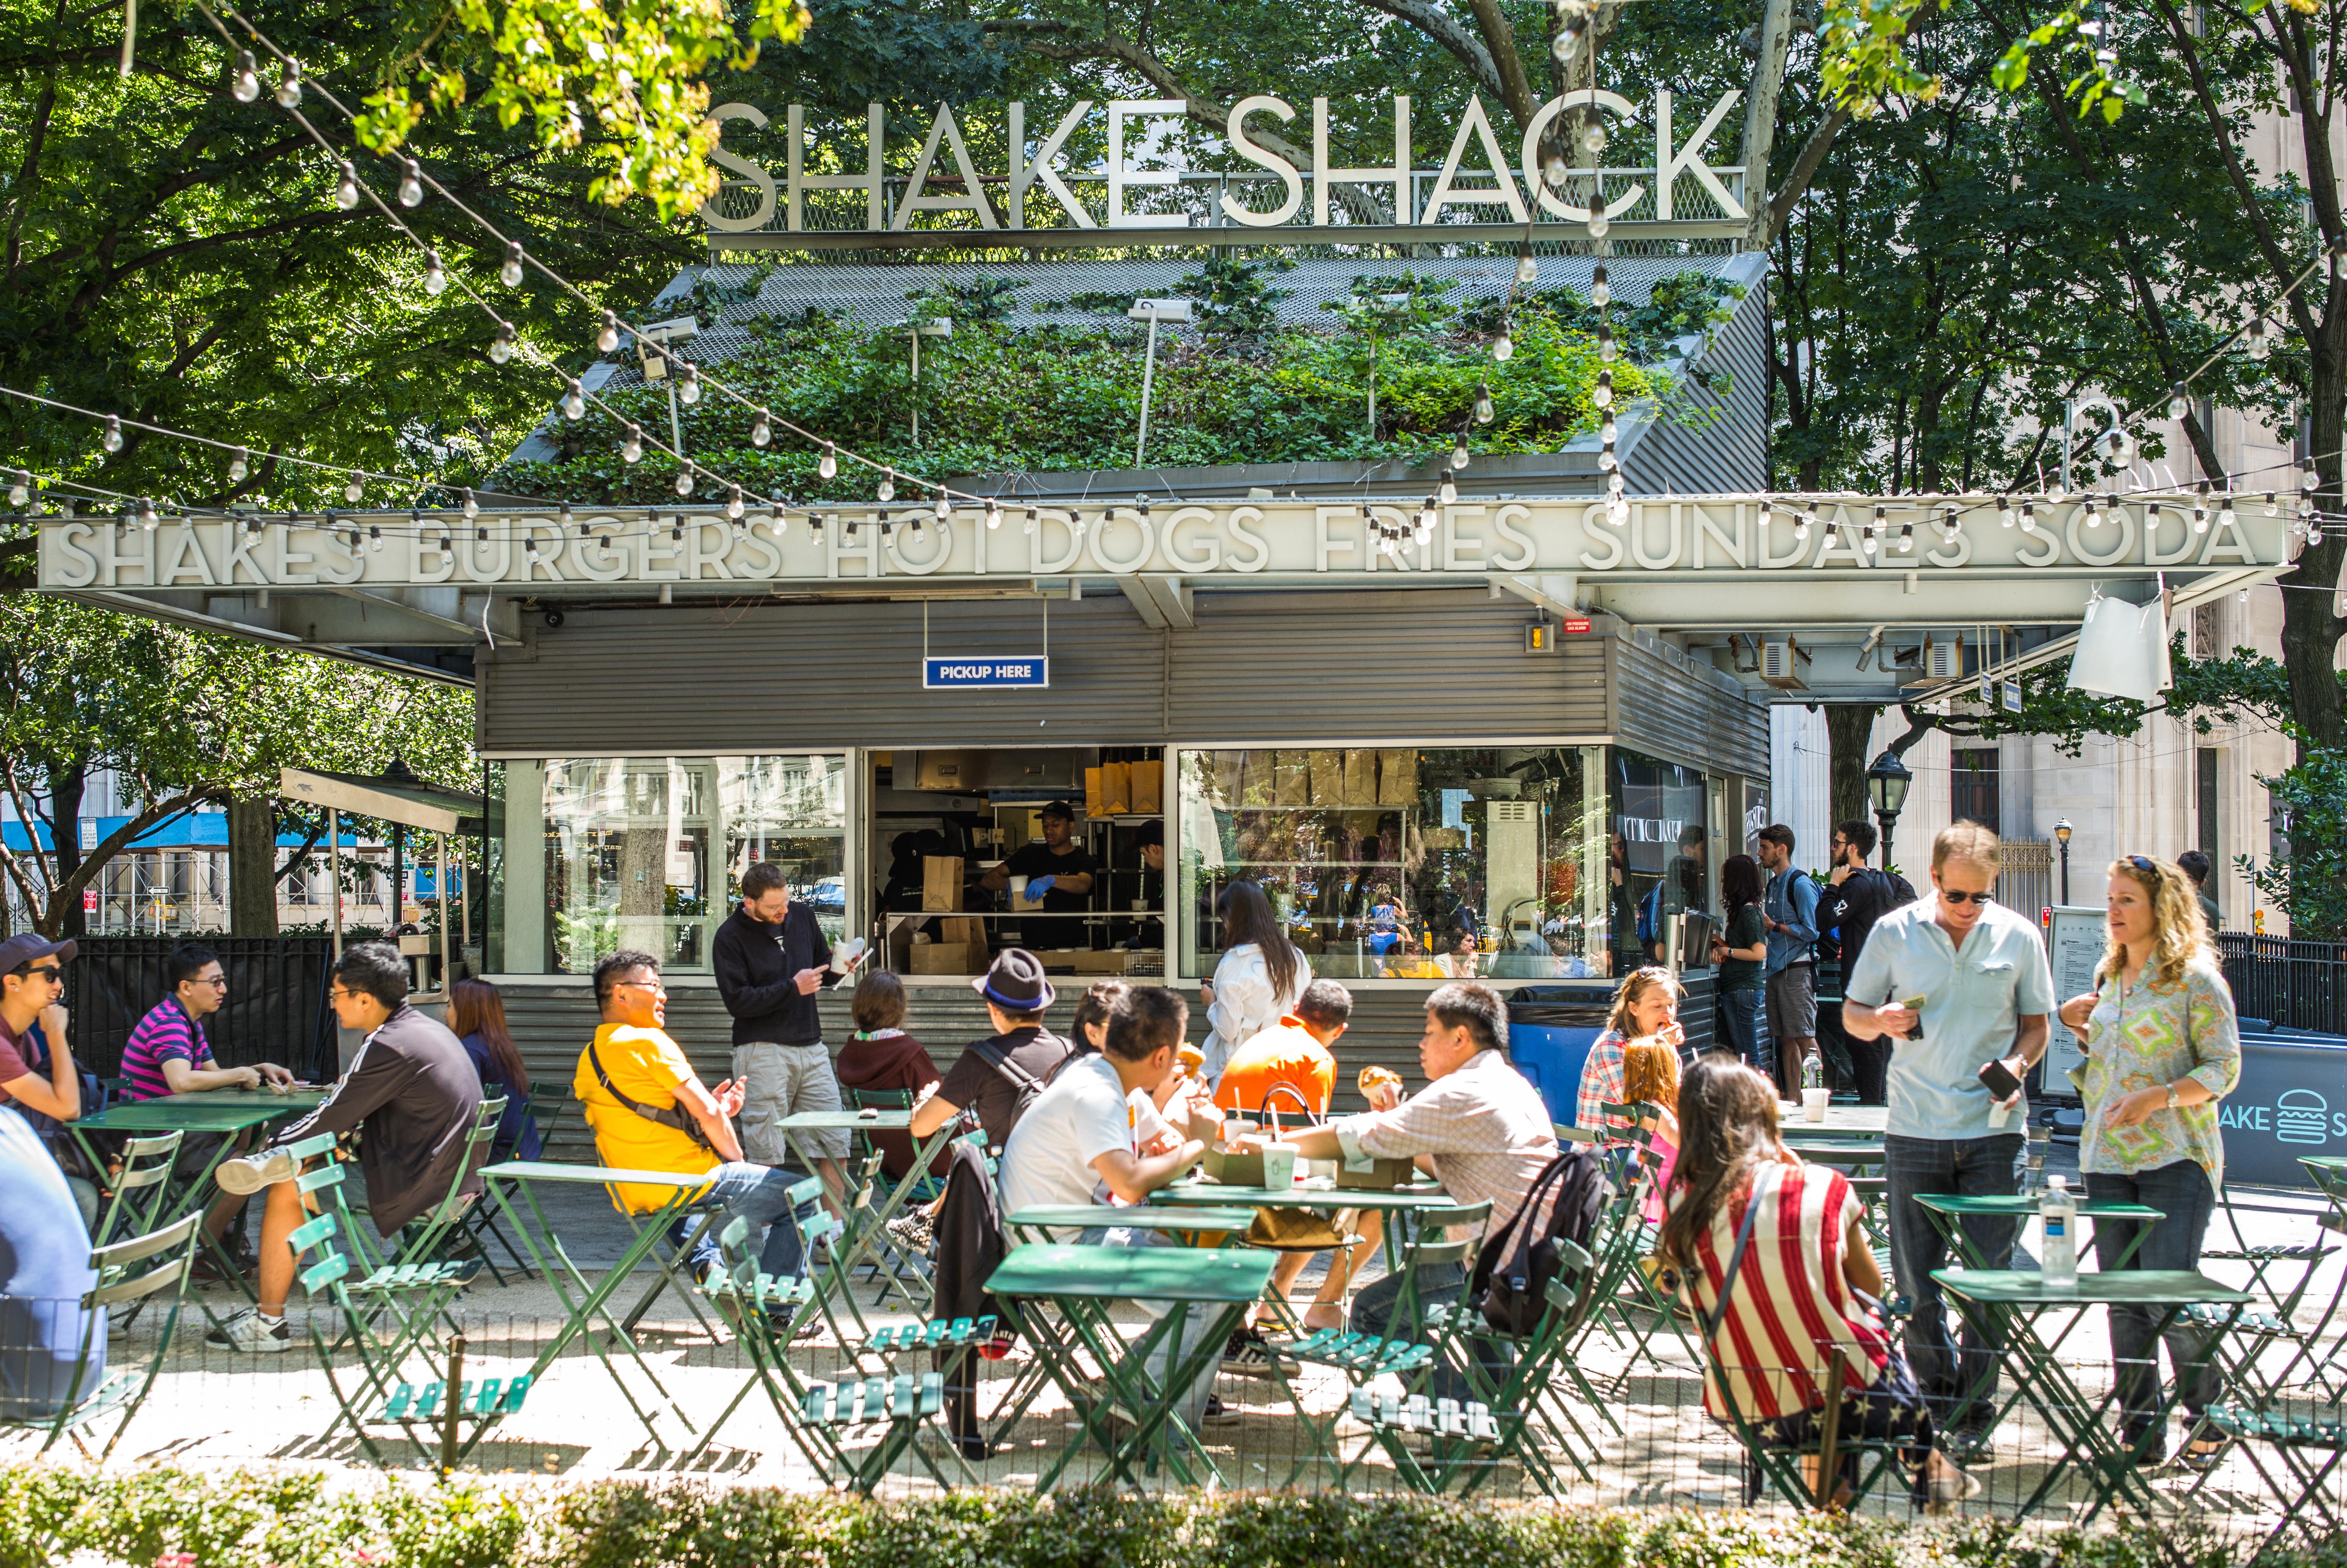 The original Shake Shack